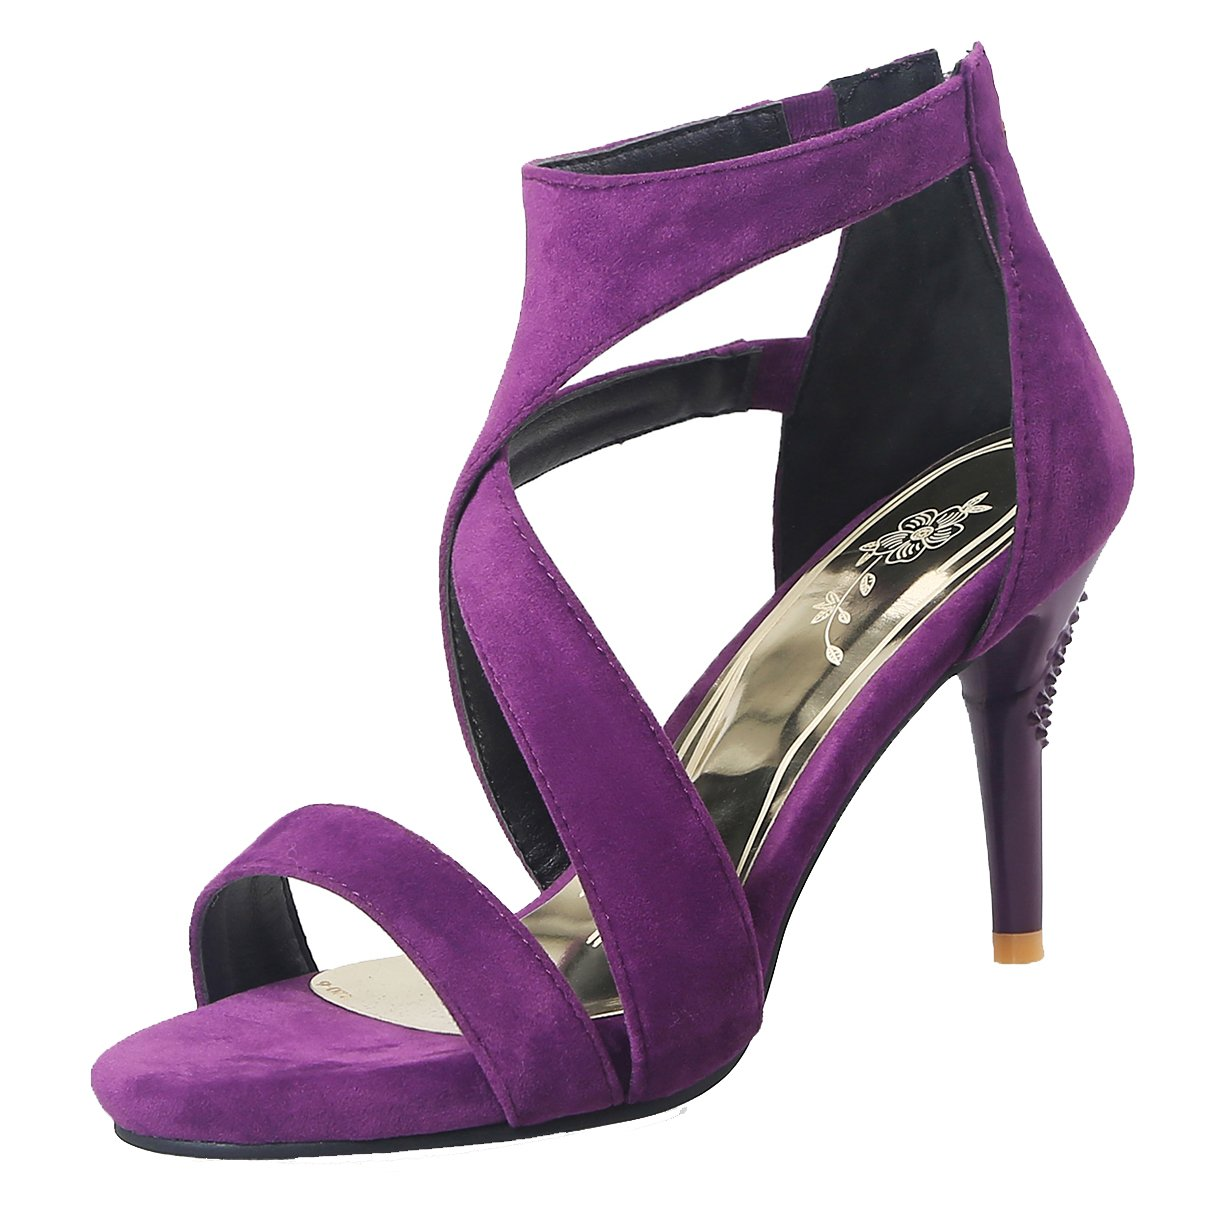 JYshoes Spartiates Femme Femme Spartiates B07BFDDP9F Lilas 9a31862 - piero.space